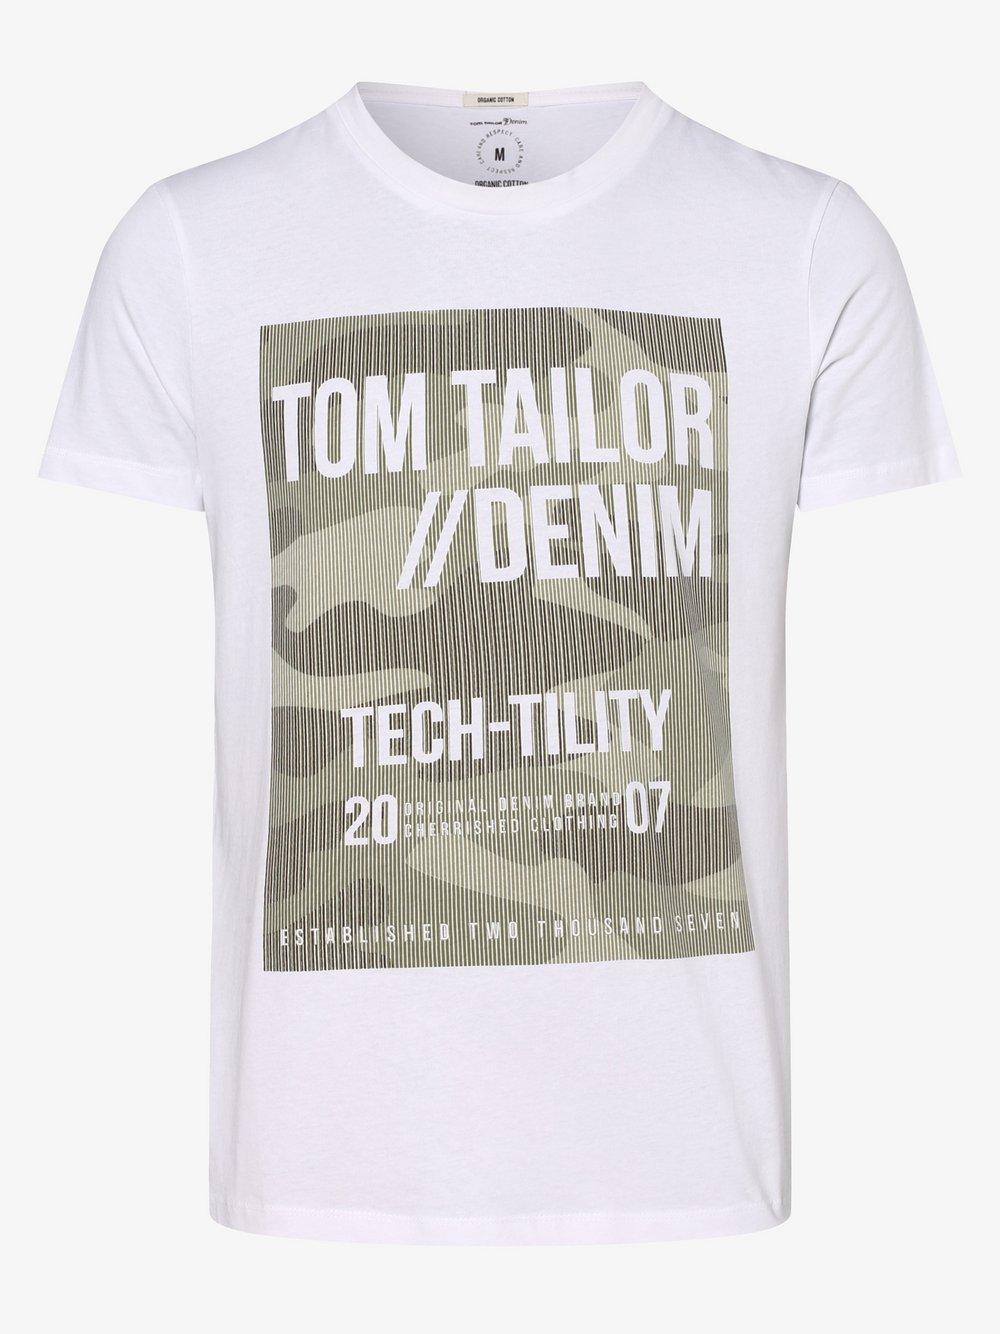 Tom Tailor – T-shirt męski, biały Van Graaf 498406-0002-09970